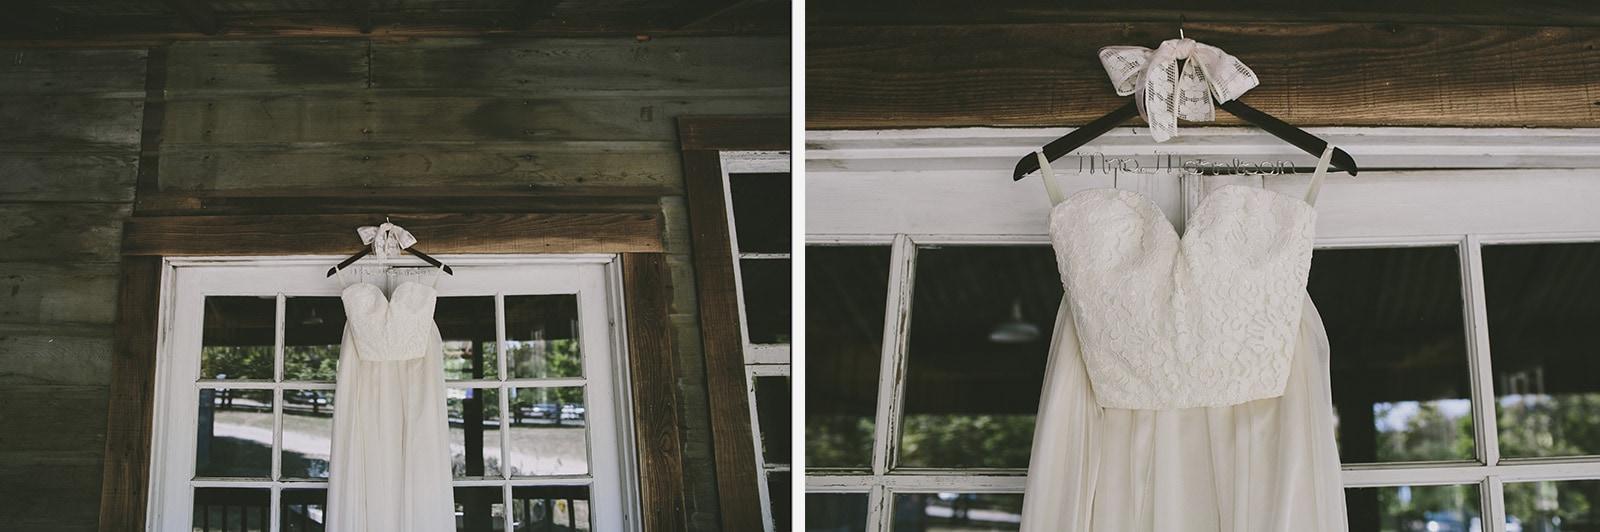 radonich_ranch_wedding_los_gatos_wedding_008